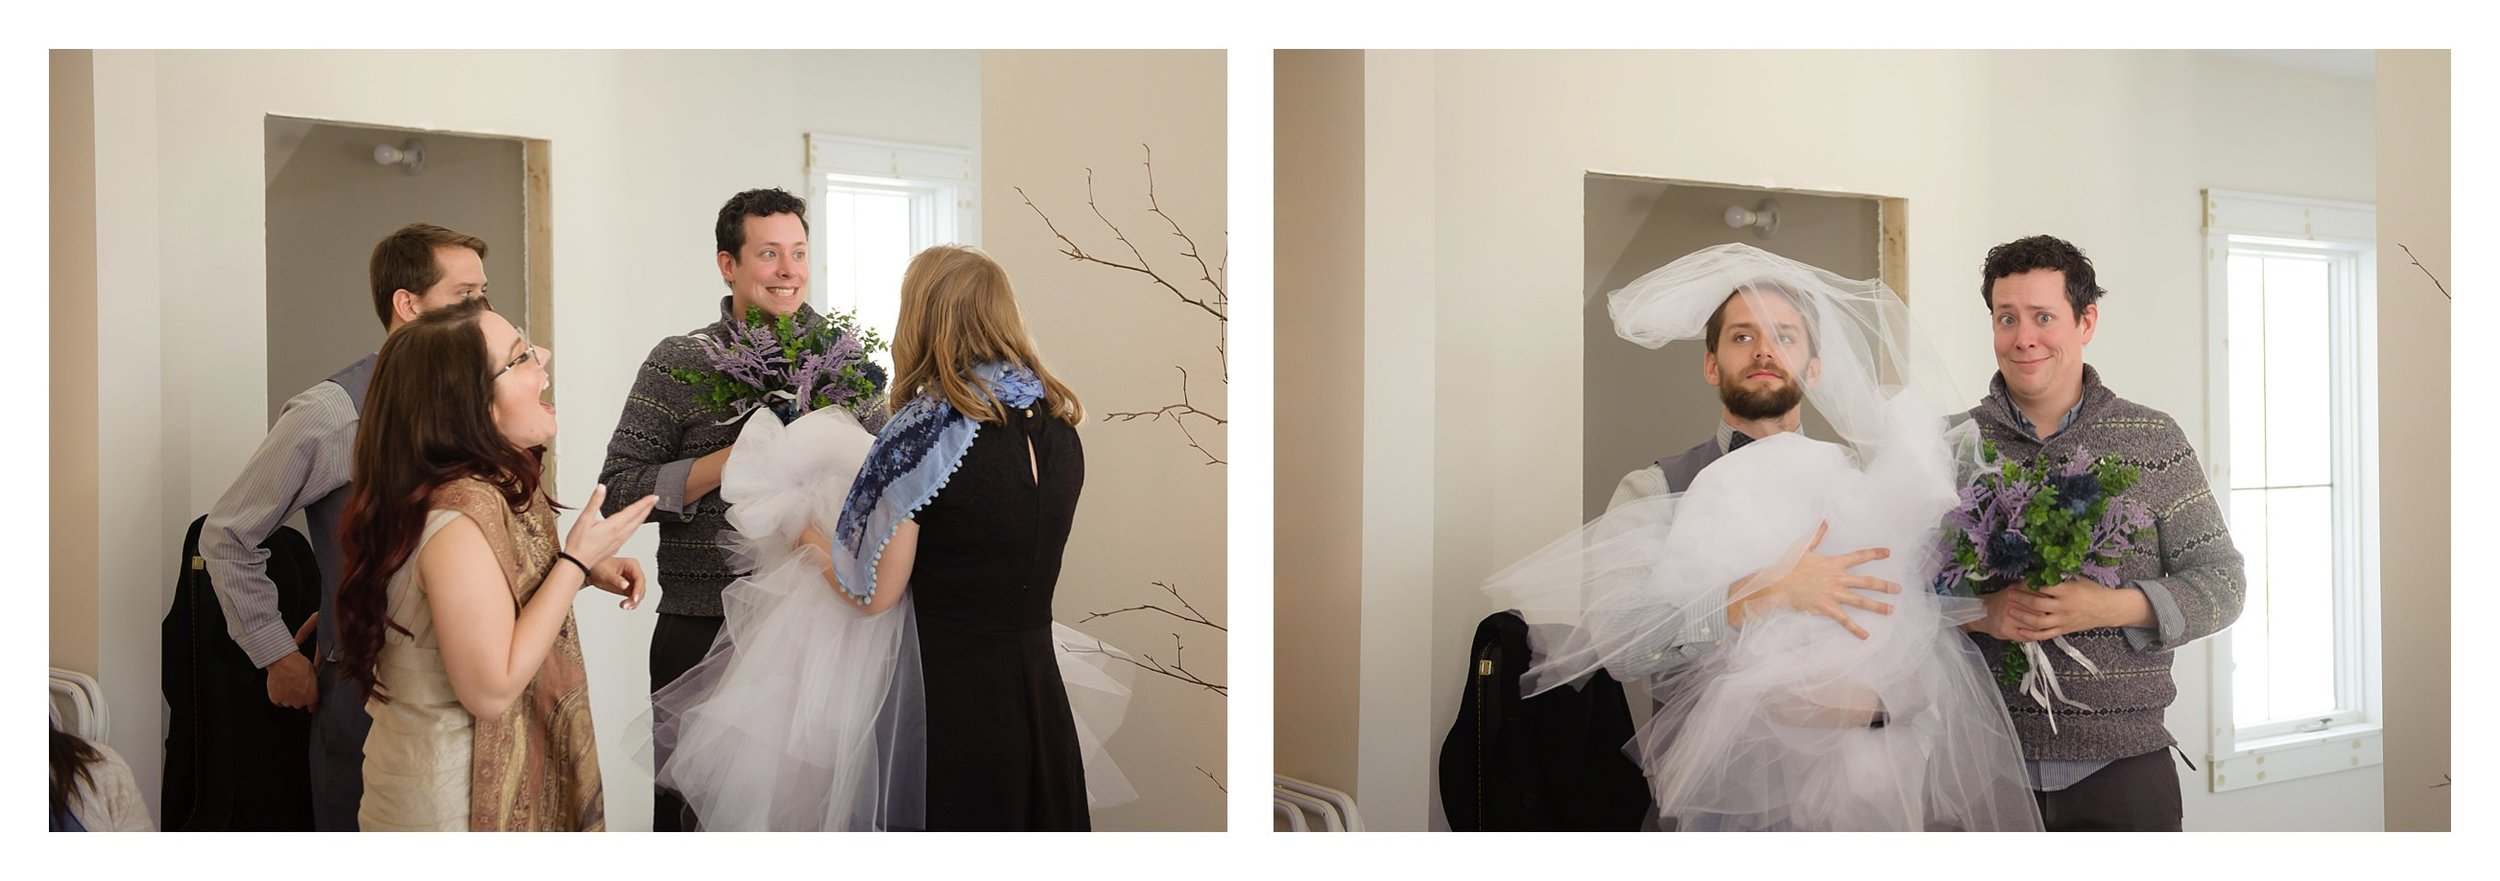 wisconsin wedding photographer timber baron inn bayfield wi ps 139 photography jen jensen_0210.jpg